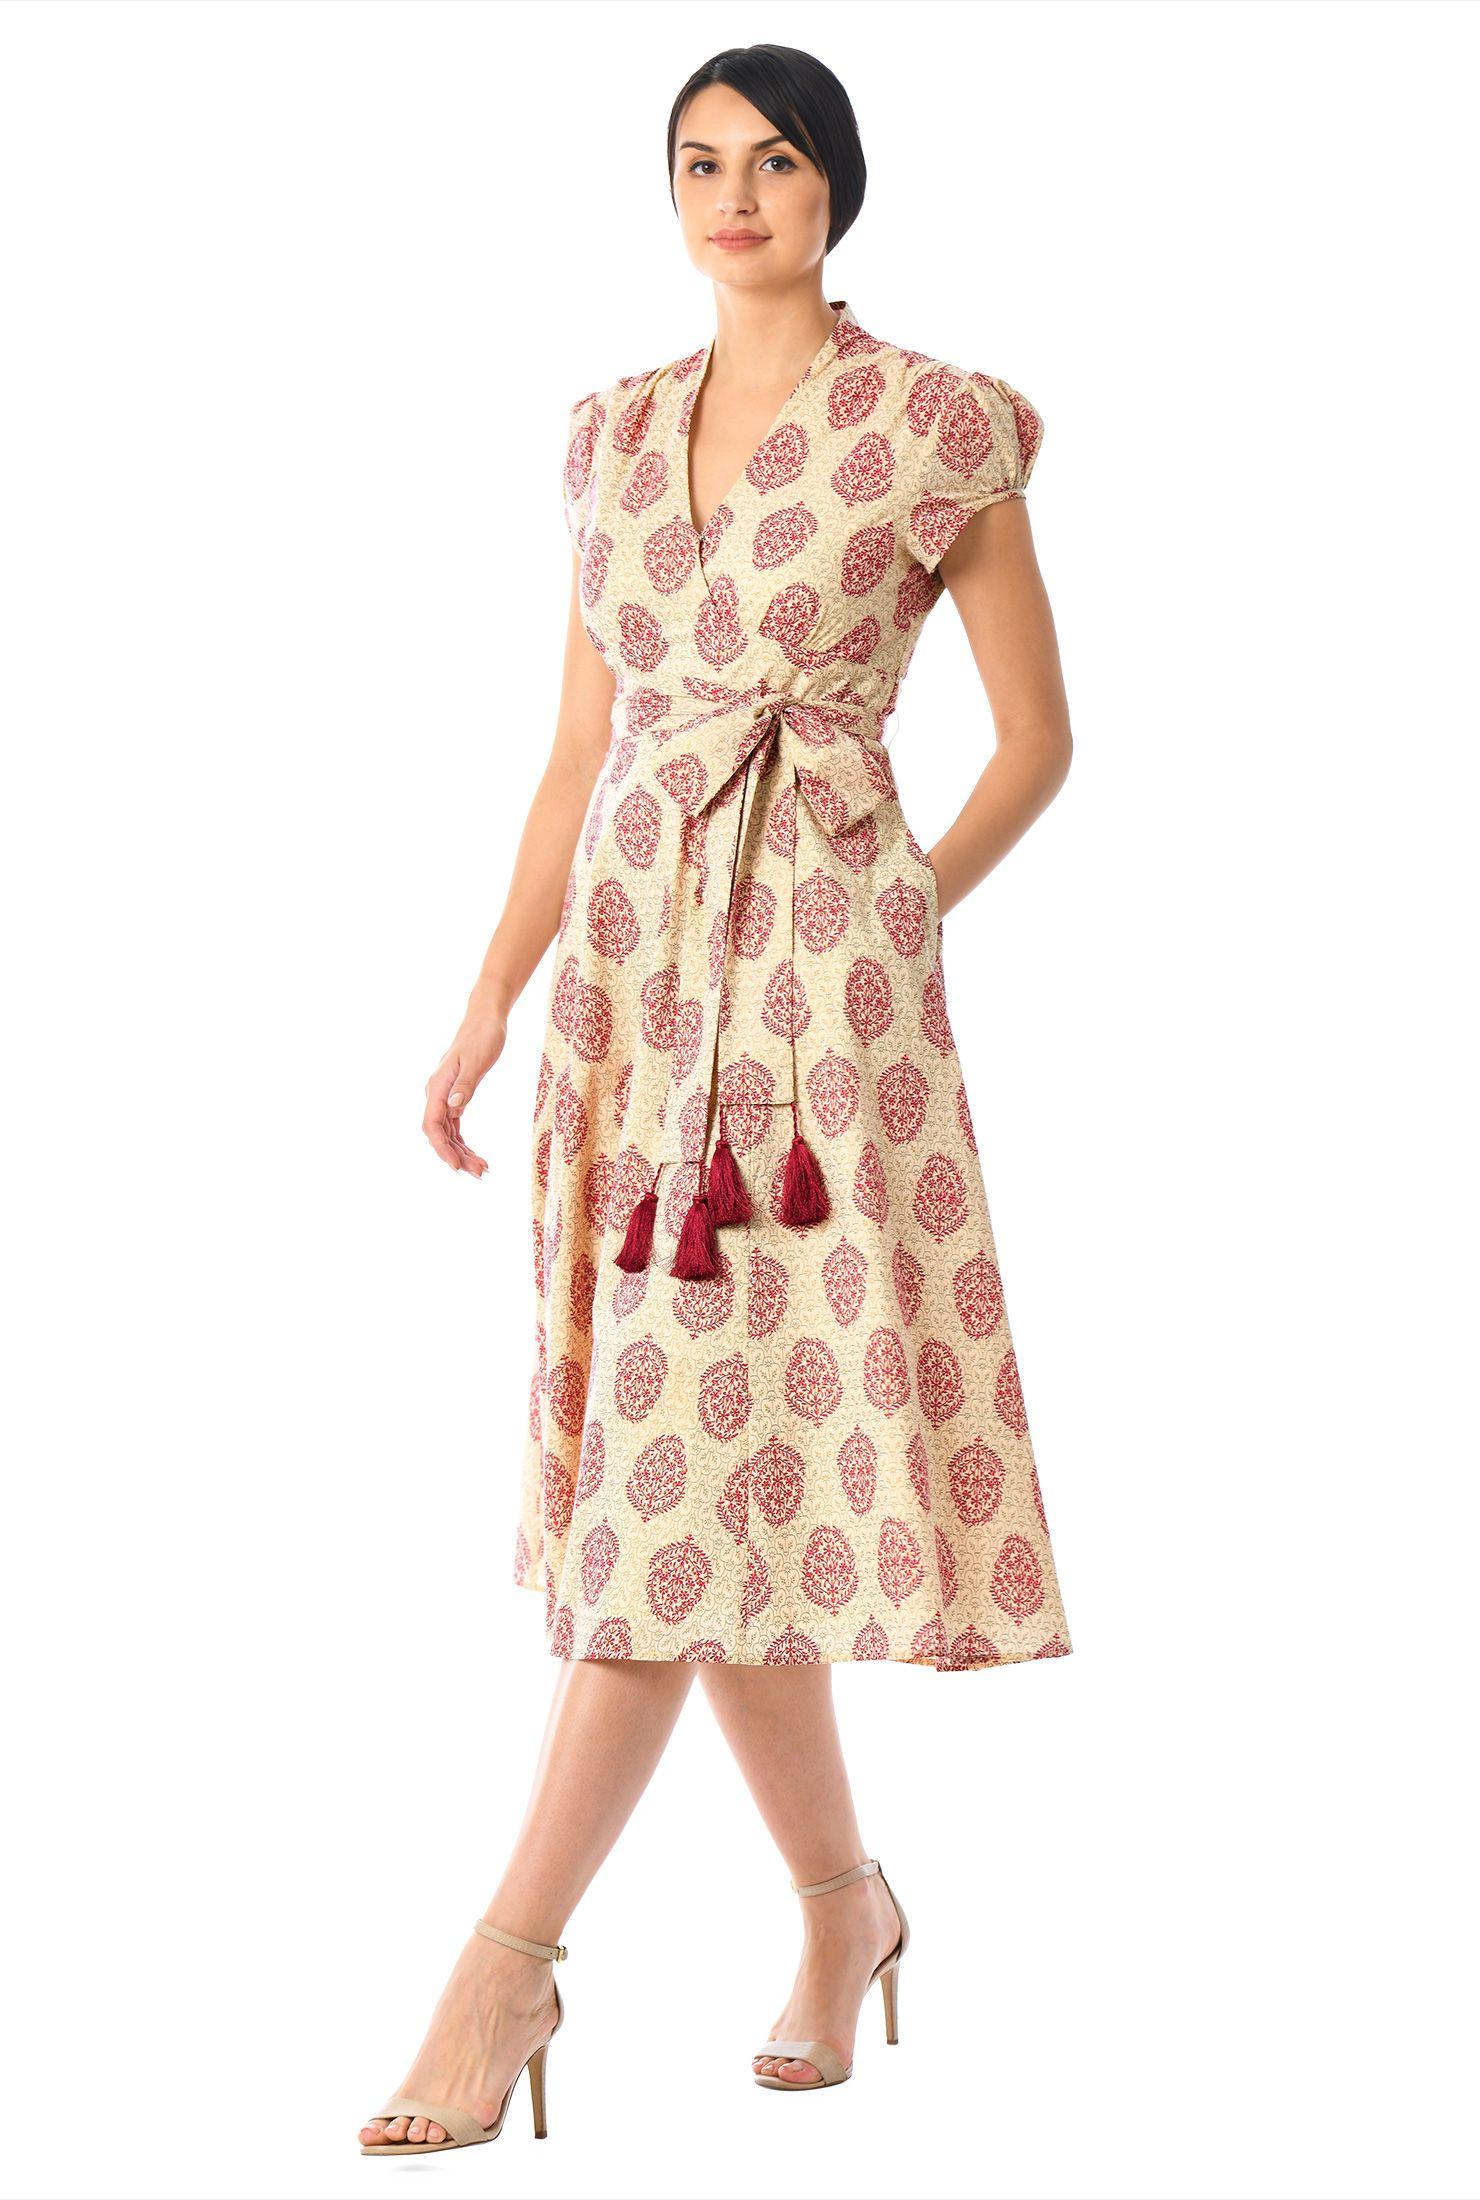 7a759ed1b1 Women's Fashion Clothing 0-36W and Custom Bridesmaid Dresses Online,  Paisley Print, Cotton